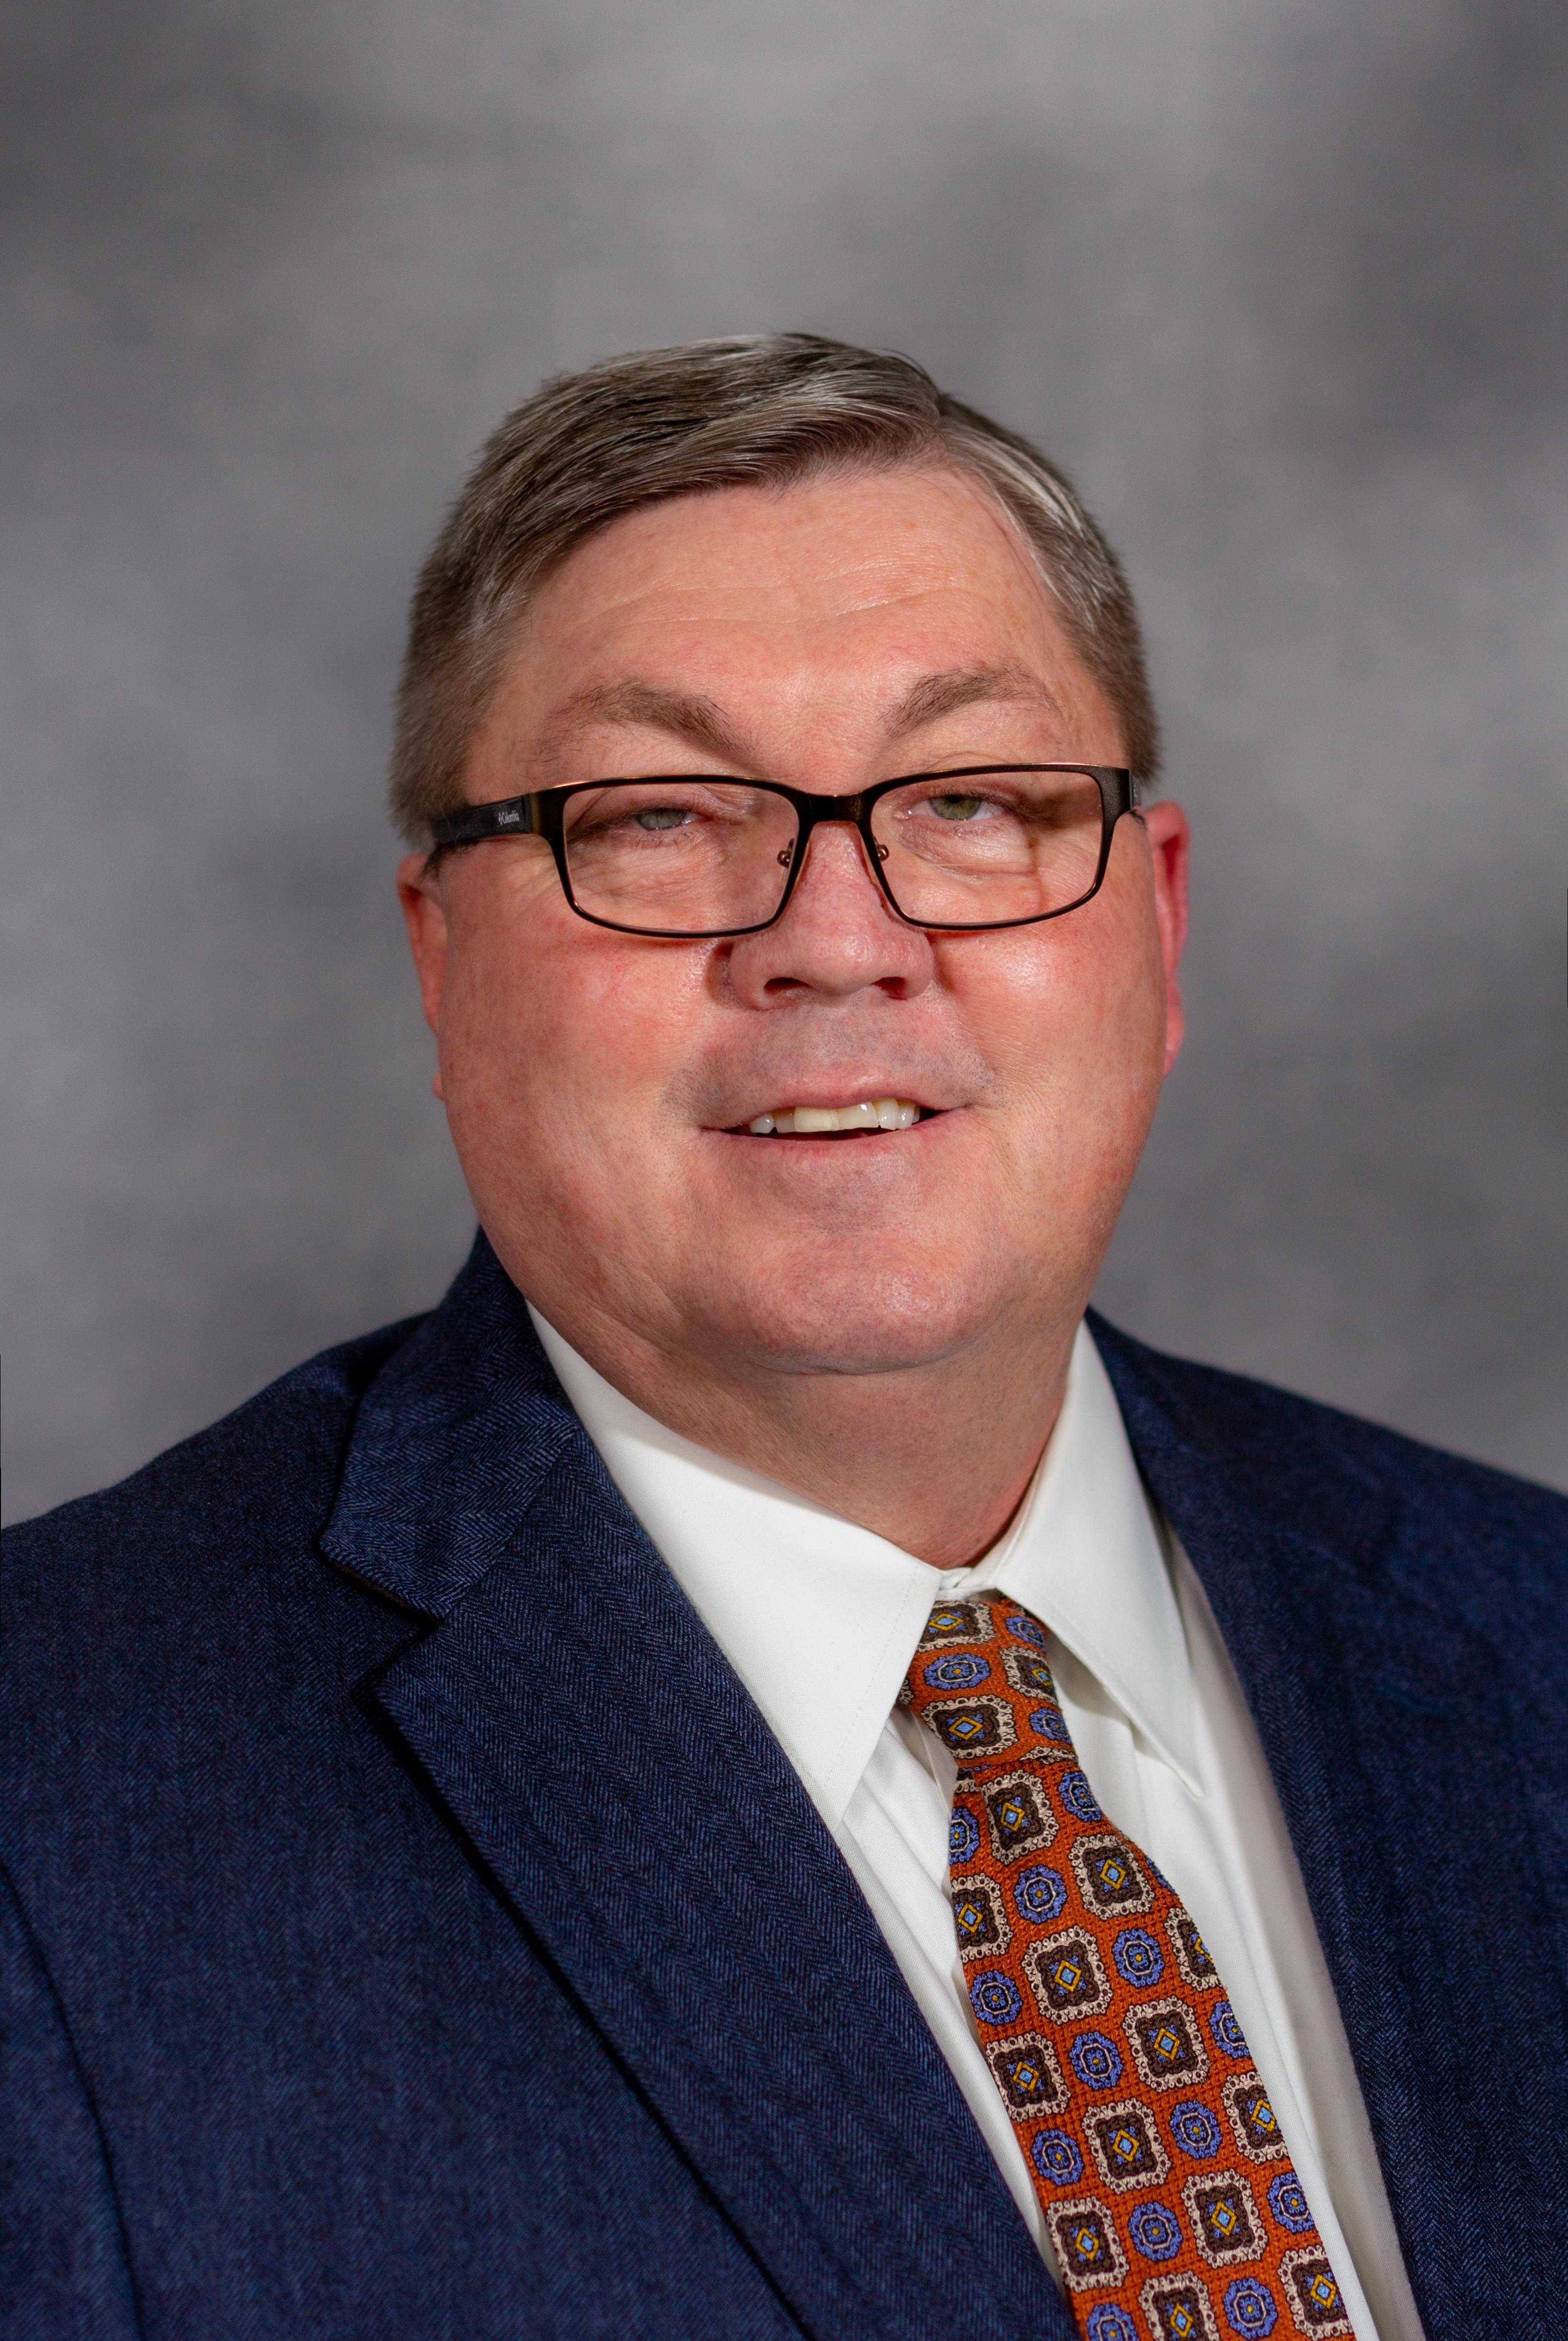 Todd Anderson, Facility Director